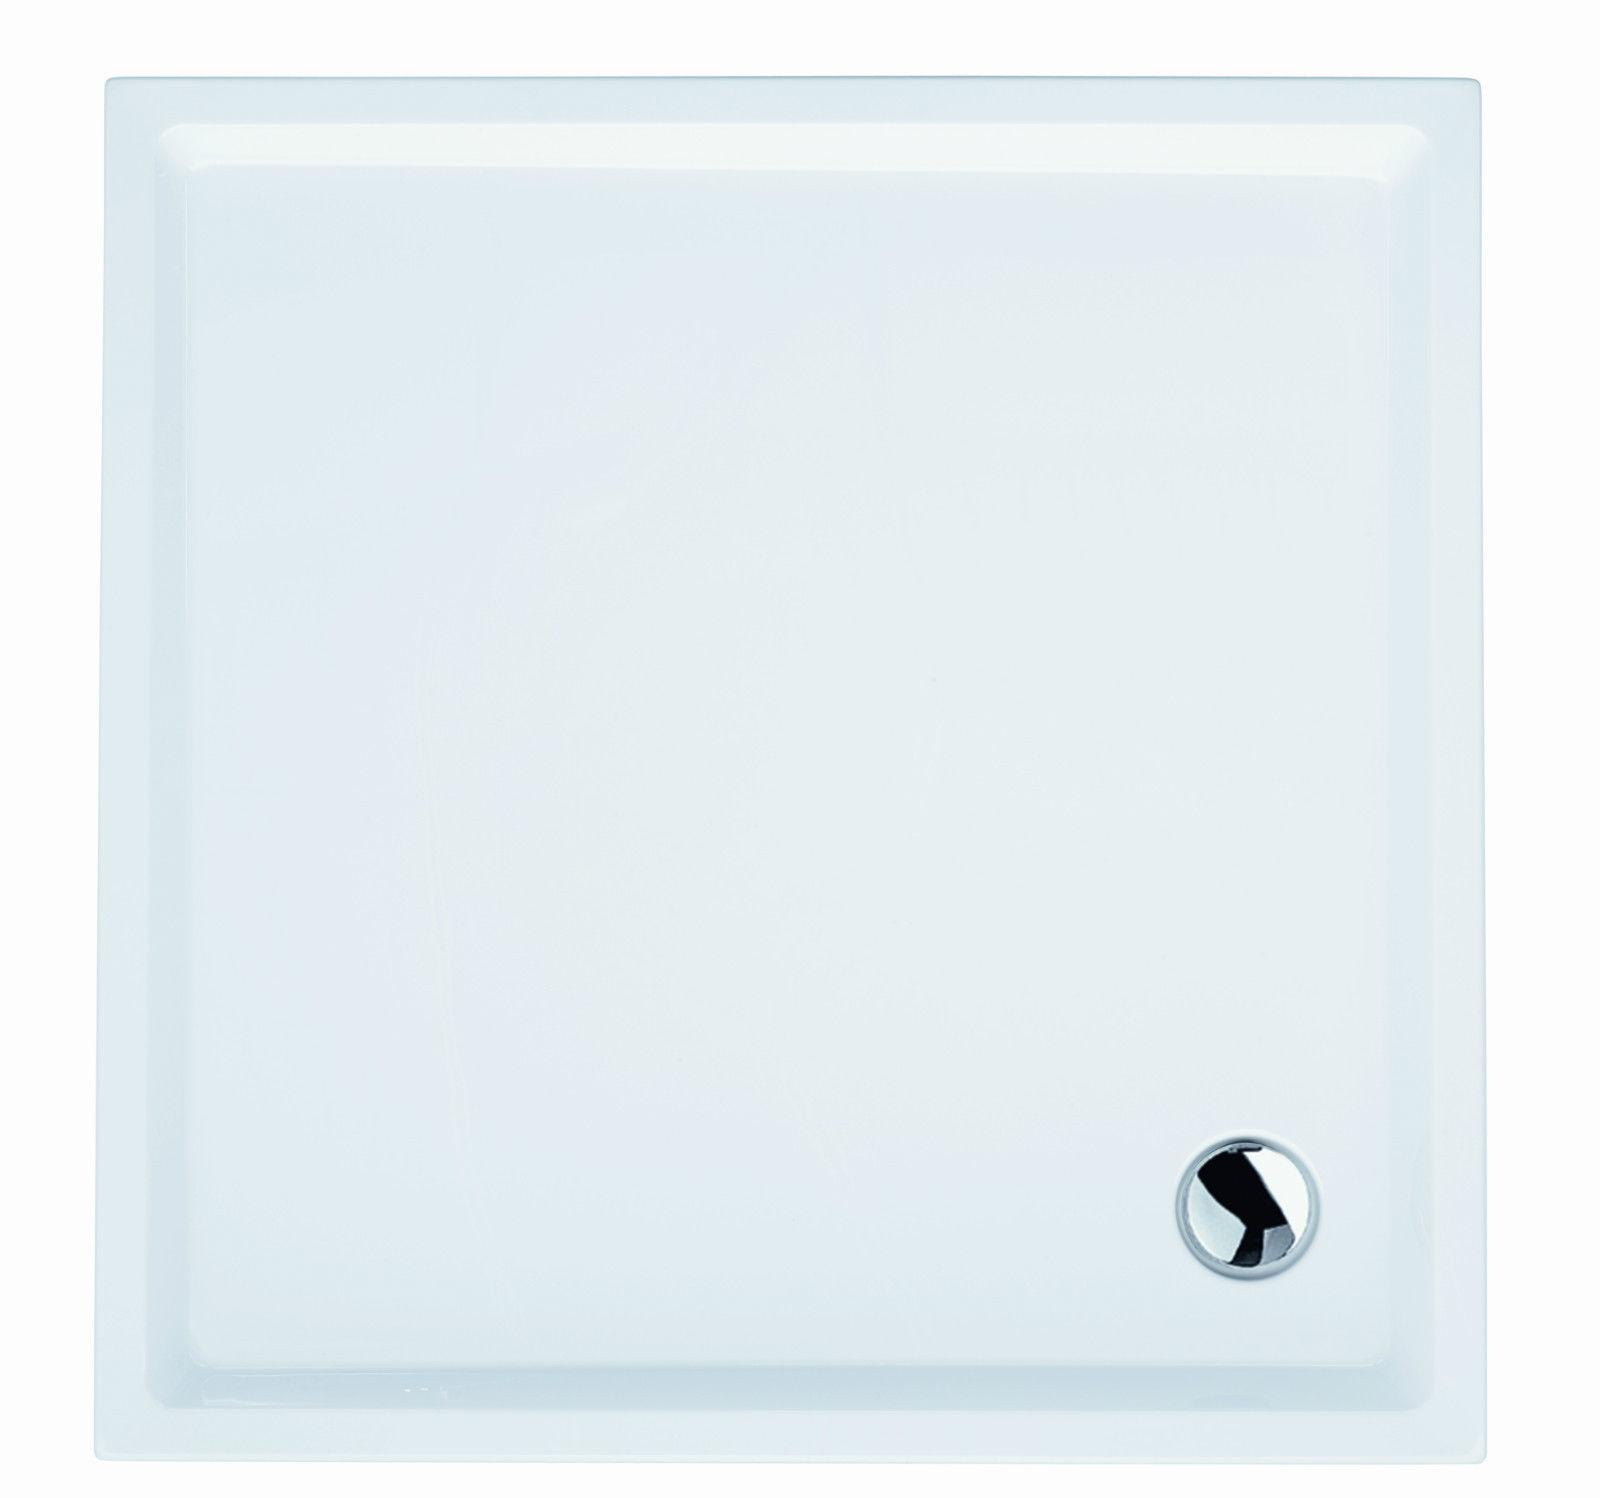 duschwanne quadratisch 90 x 90 100 x 100 120 x 120 x 2 5 beach dt fertigung ebay. Black Bedroom Furniture Sets. Home Design Ideas